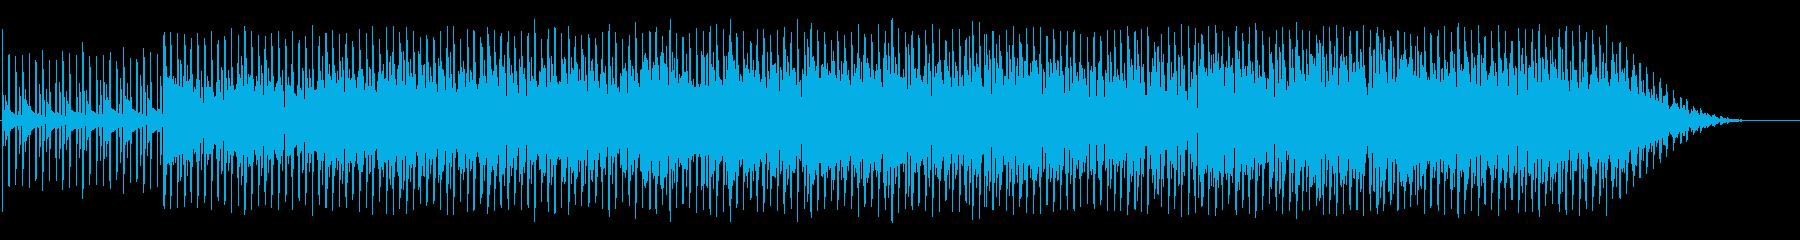 Gale Of Springの再生済みの波形